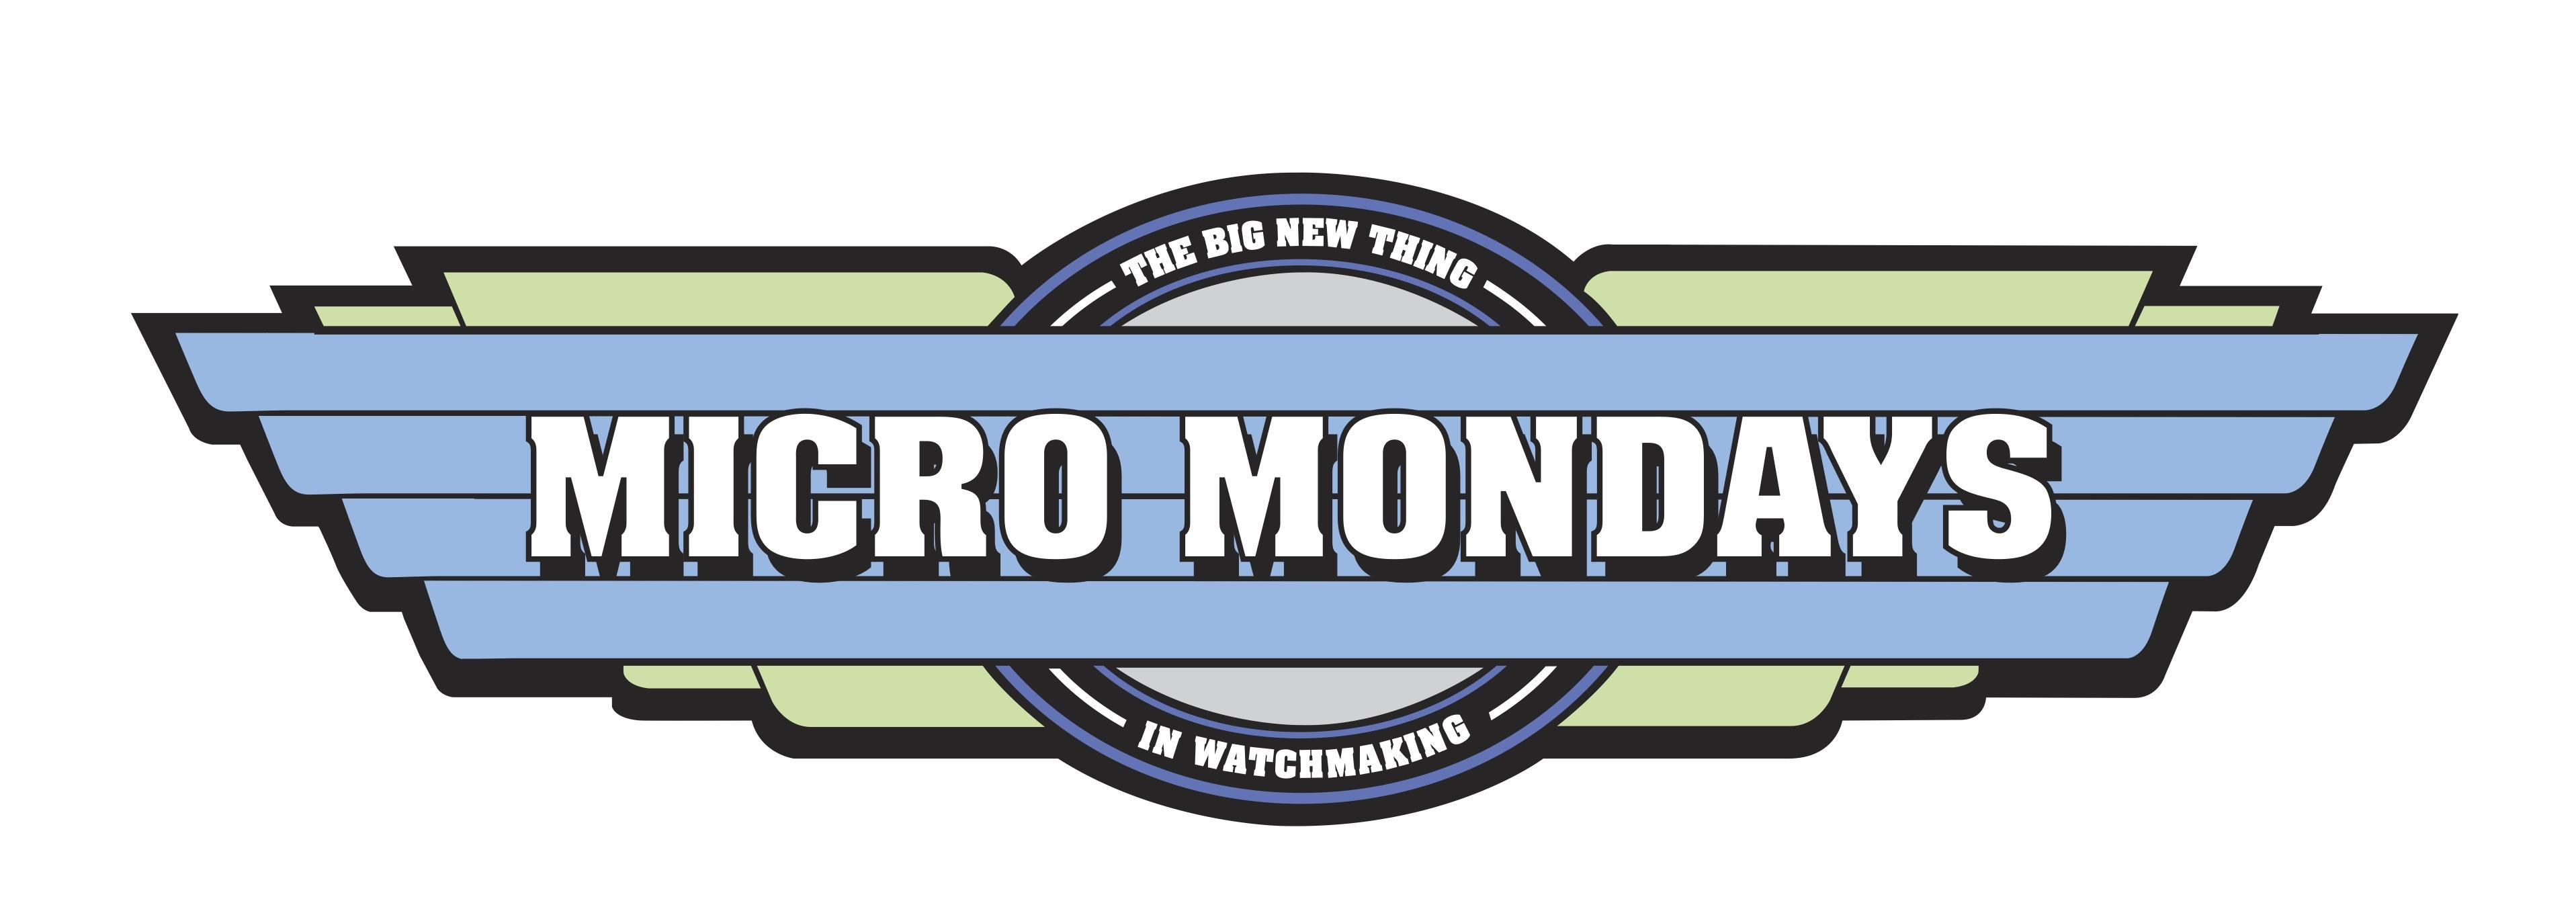 Micro Monday